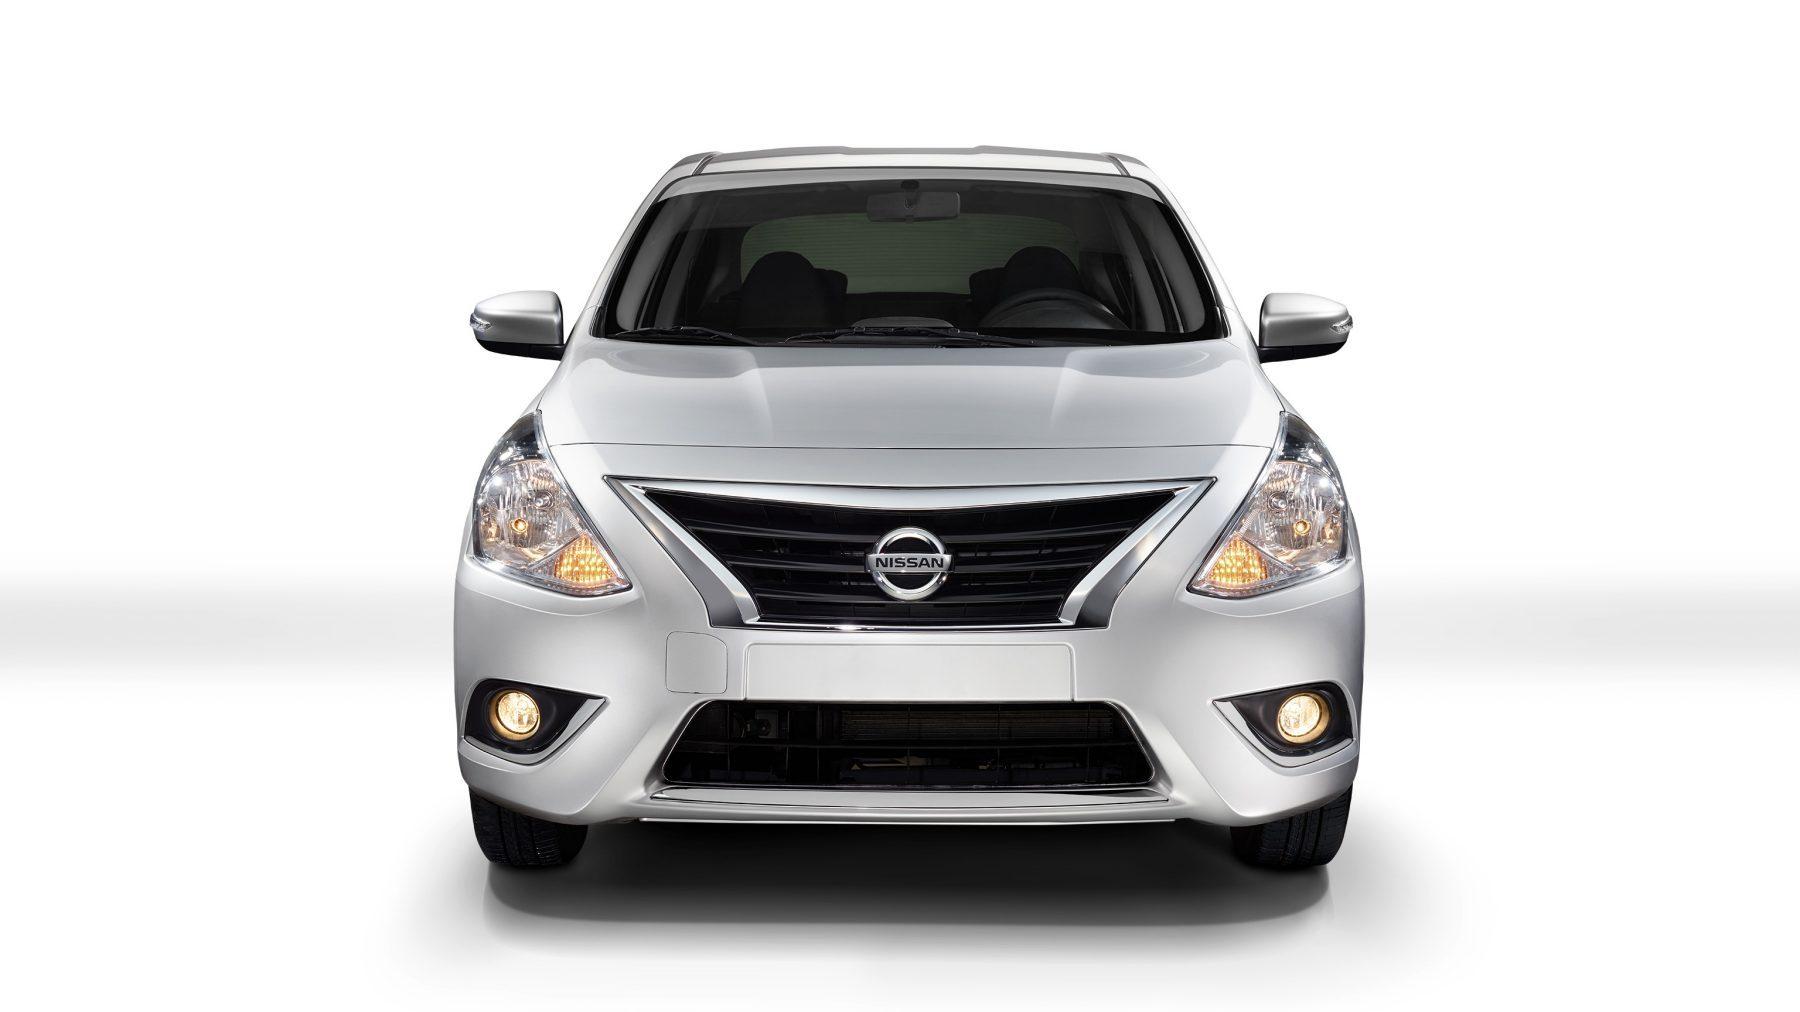 Nissan Sunny 2022 - مزايا سيارات نيسان صني 2022 ..تعرف علي مواصفاتها واسعارها